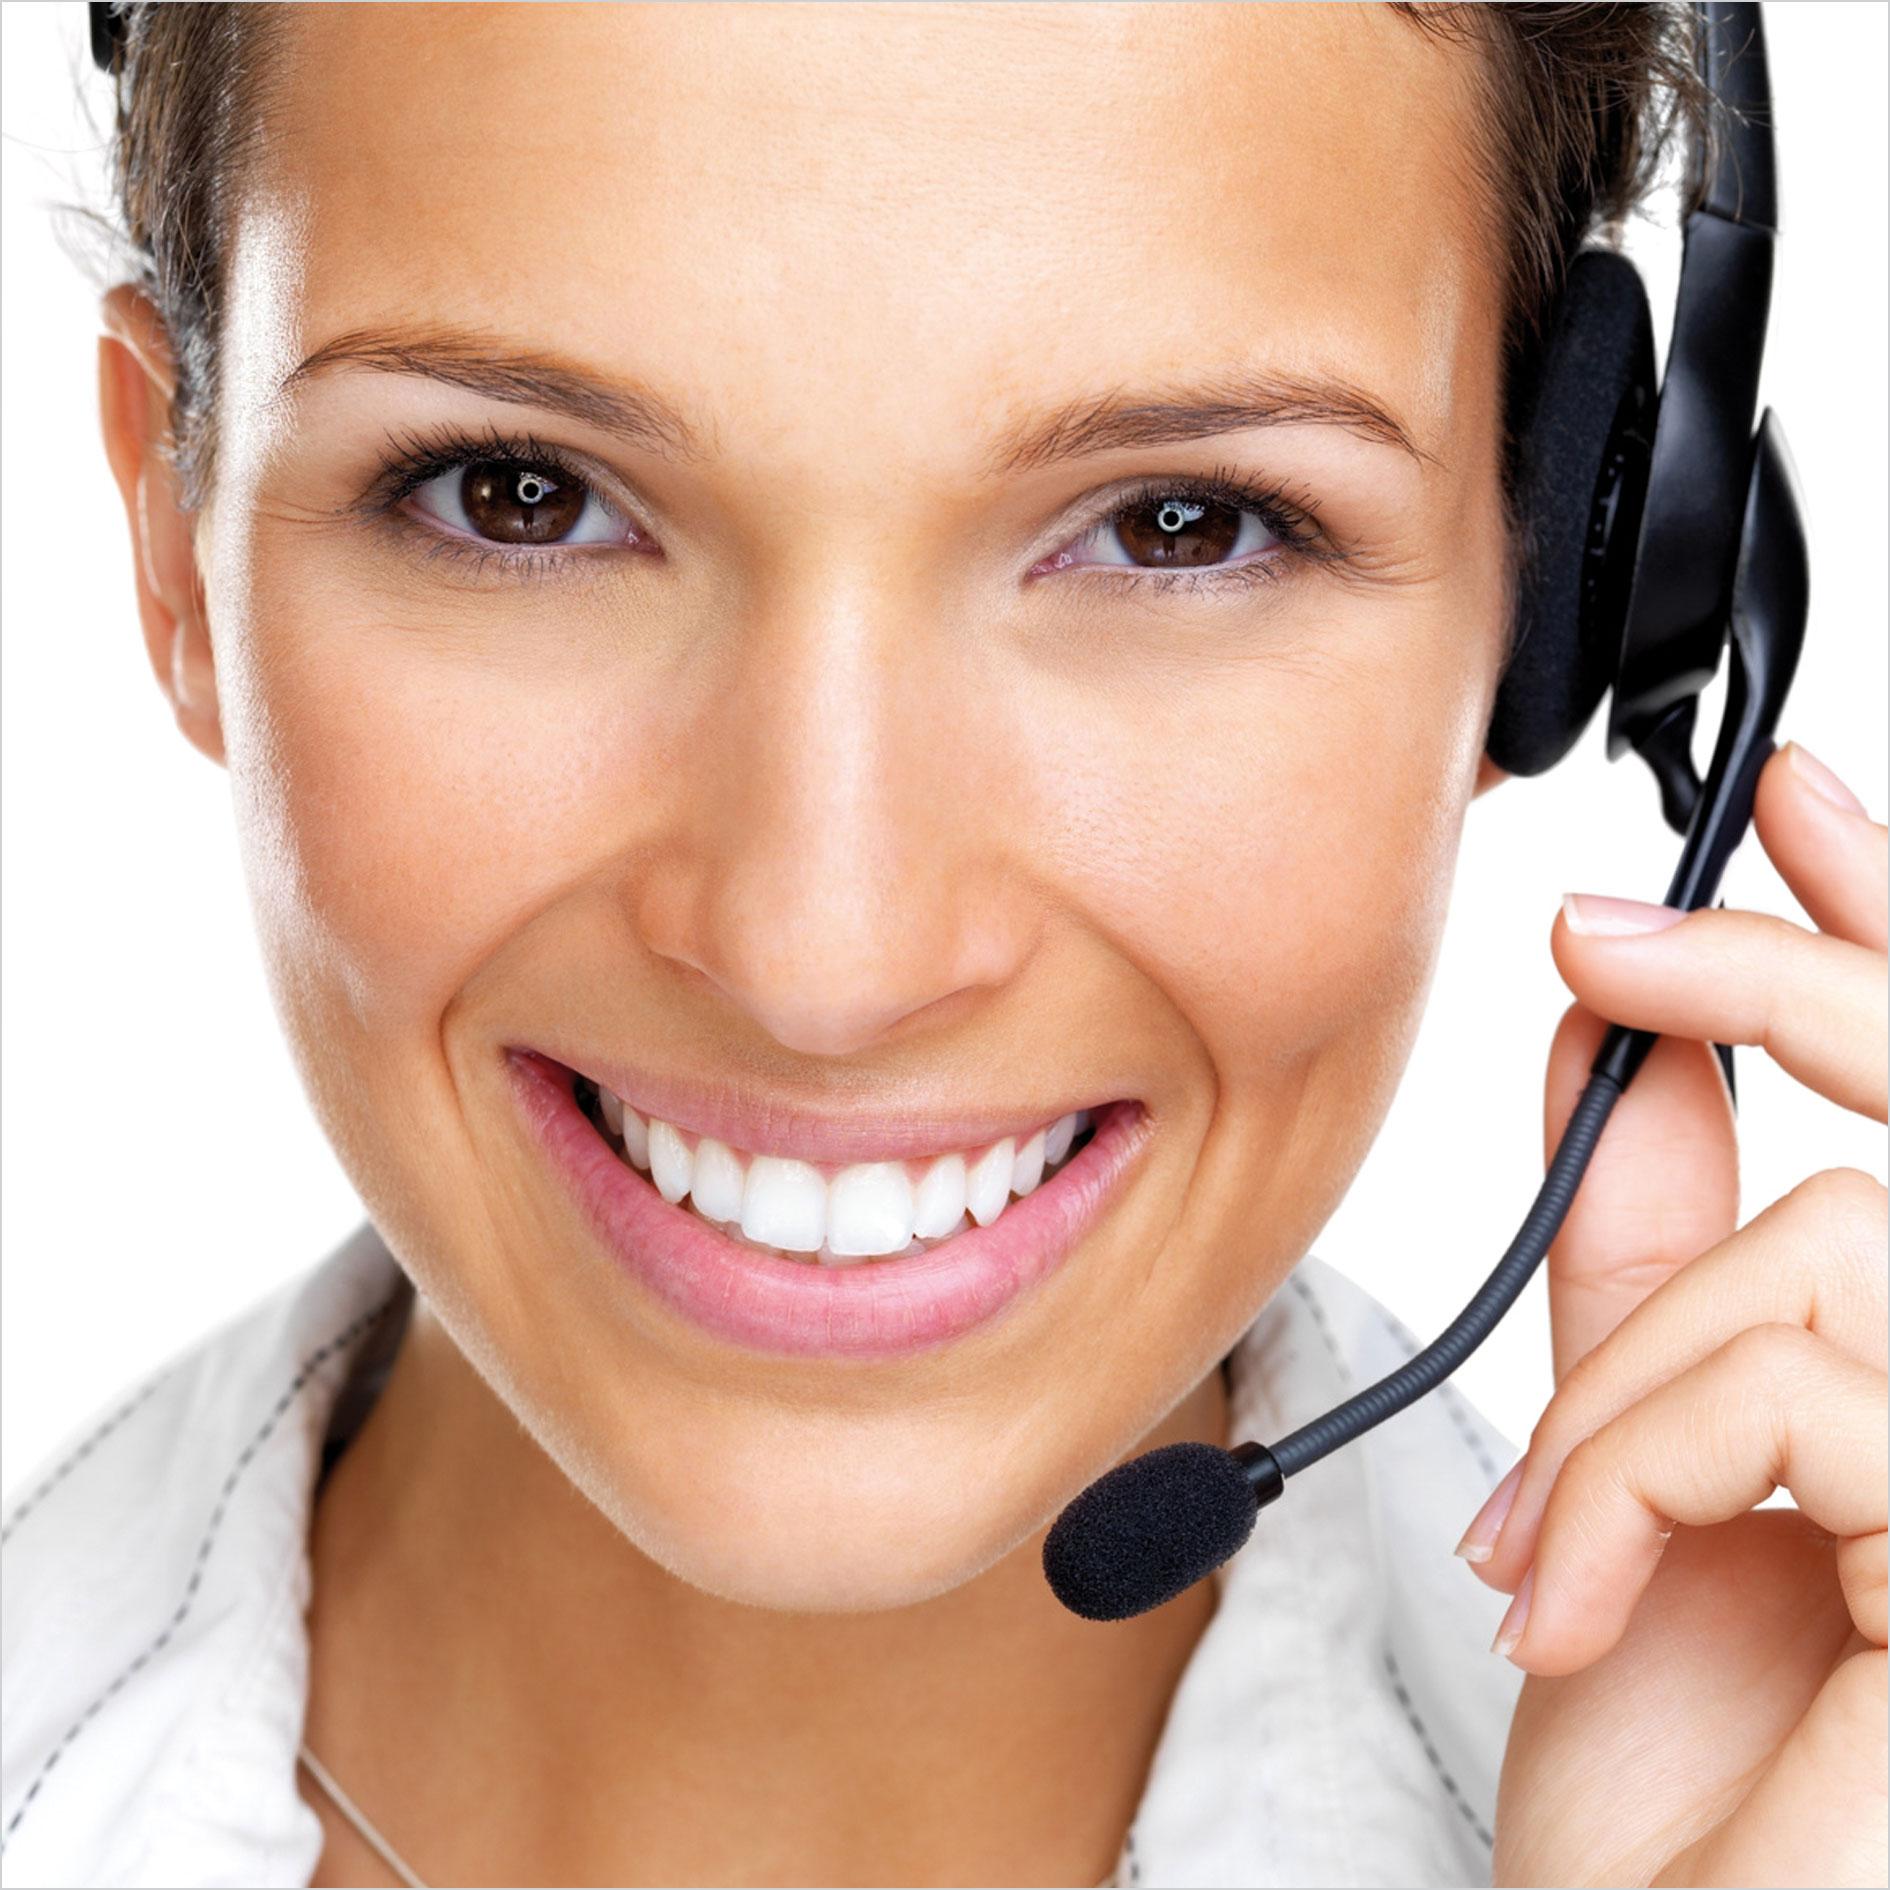 Frau mit Headset lächelt